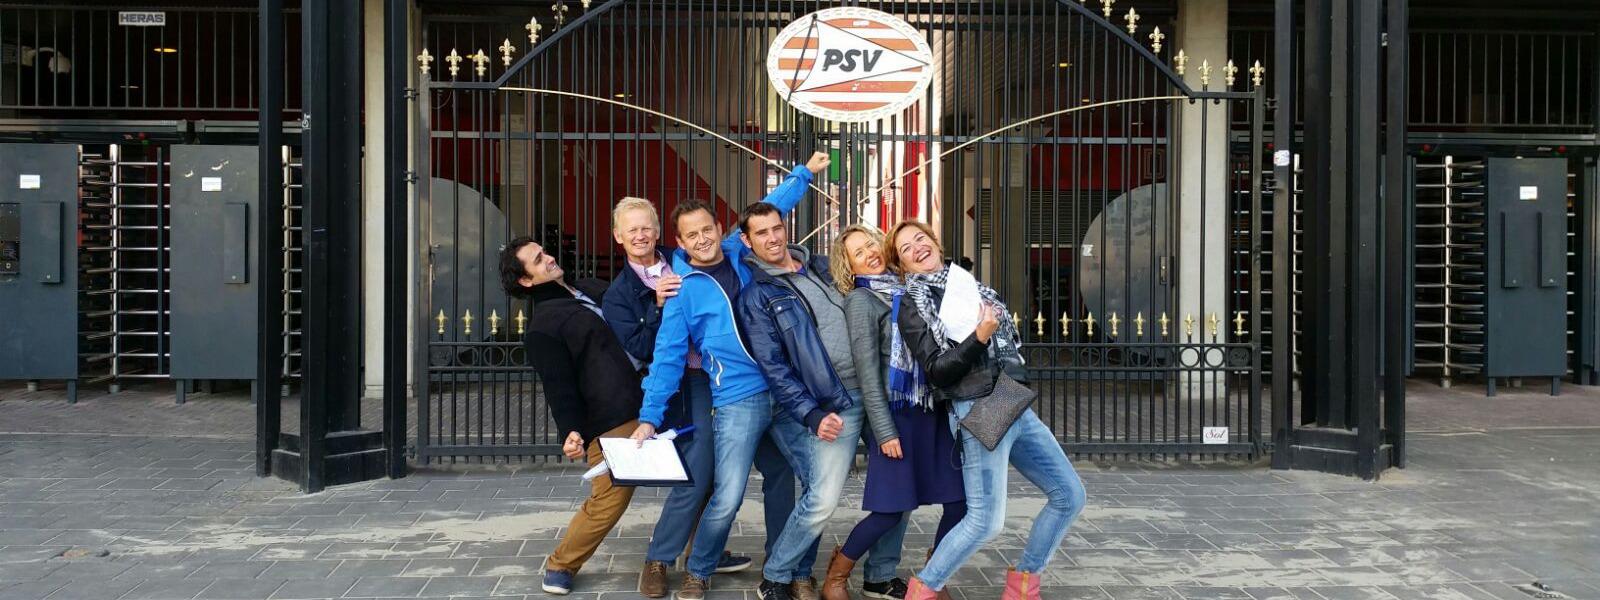 citygame-eindhoven-personeelsfeest